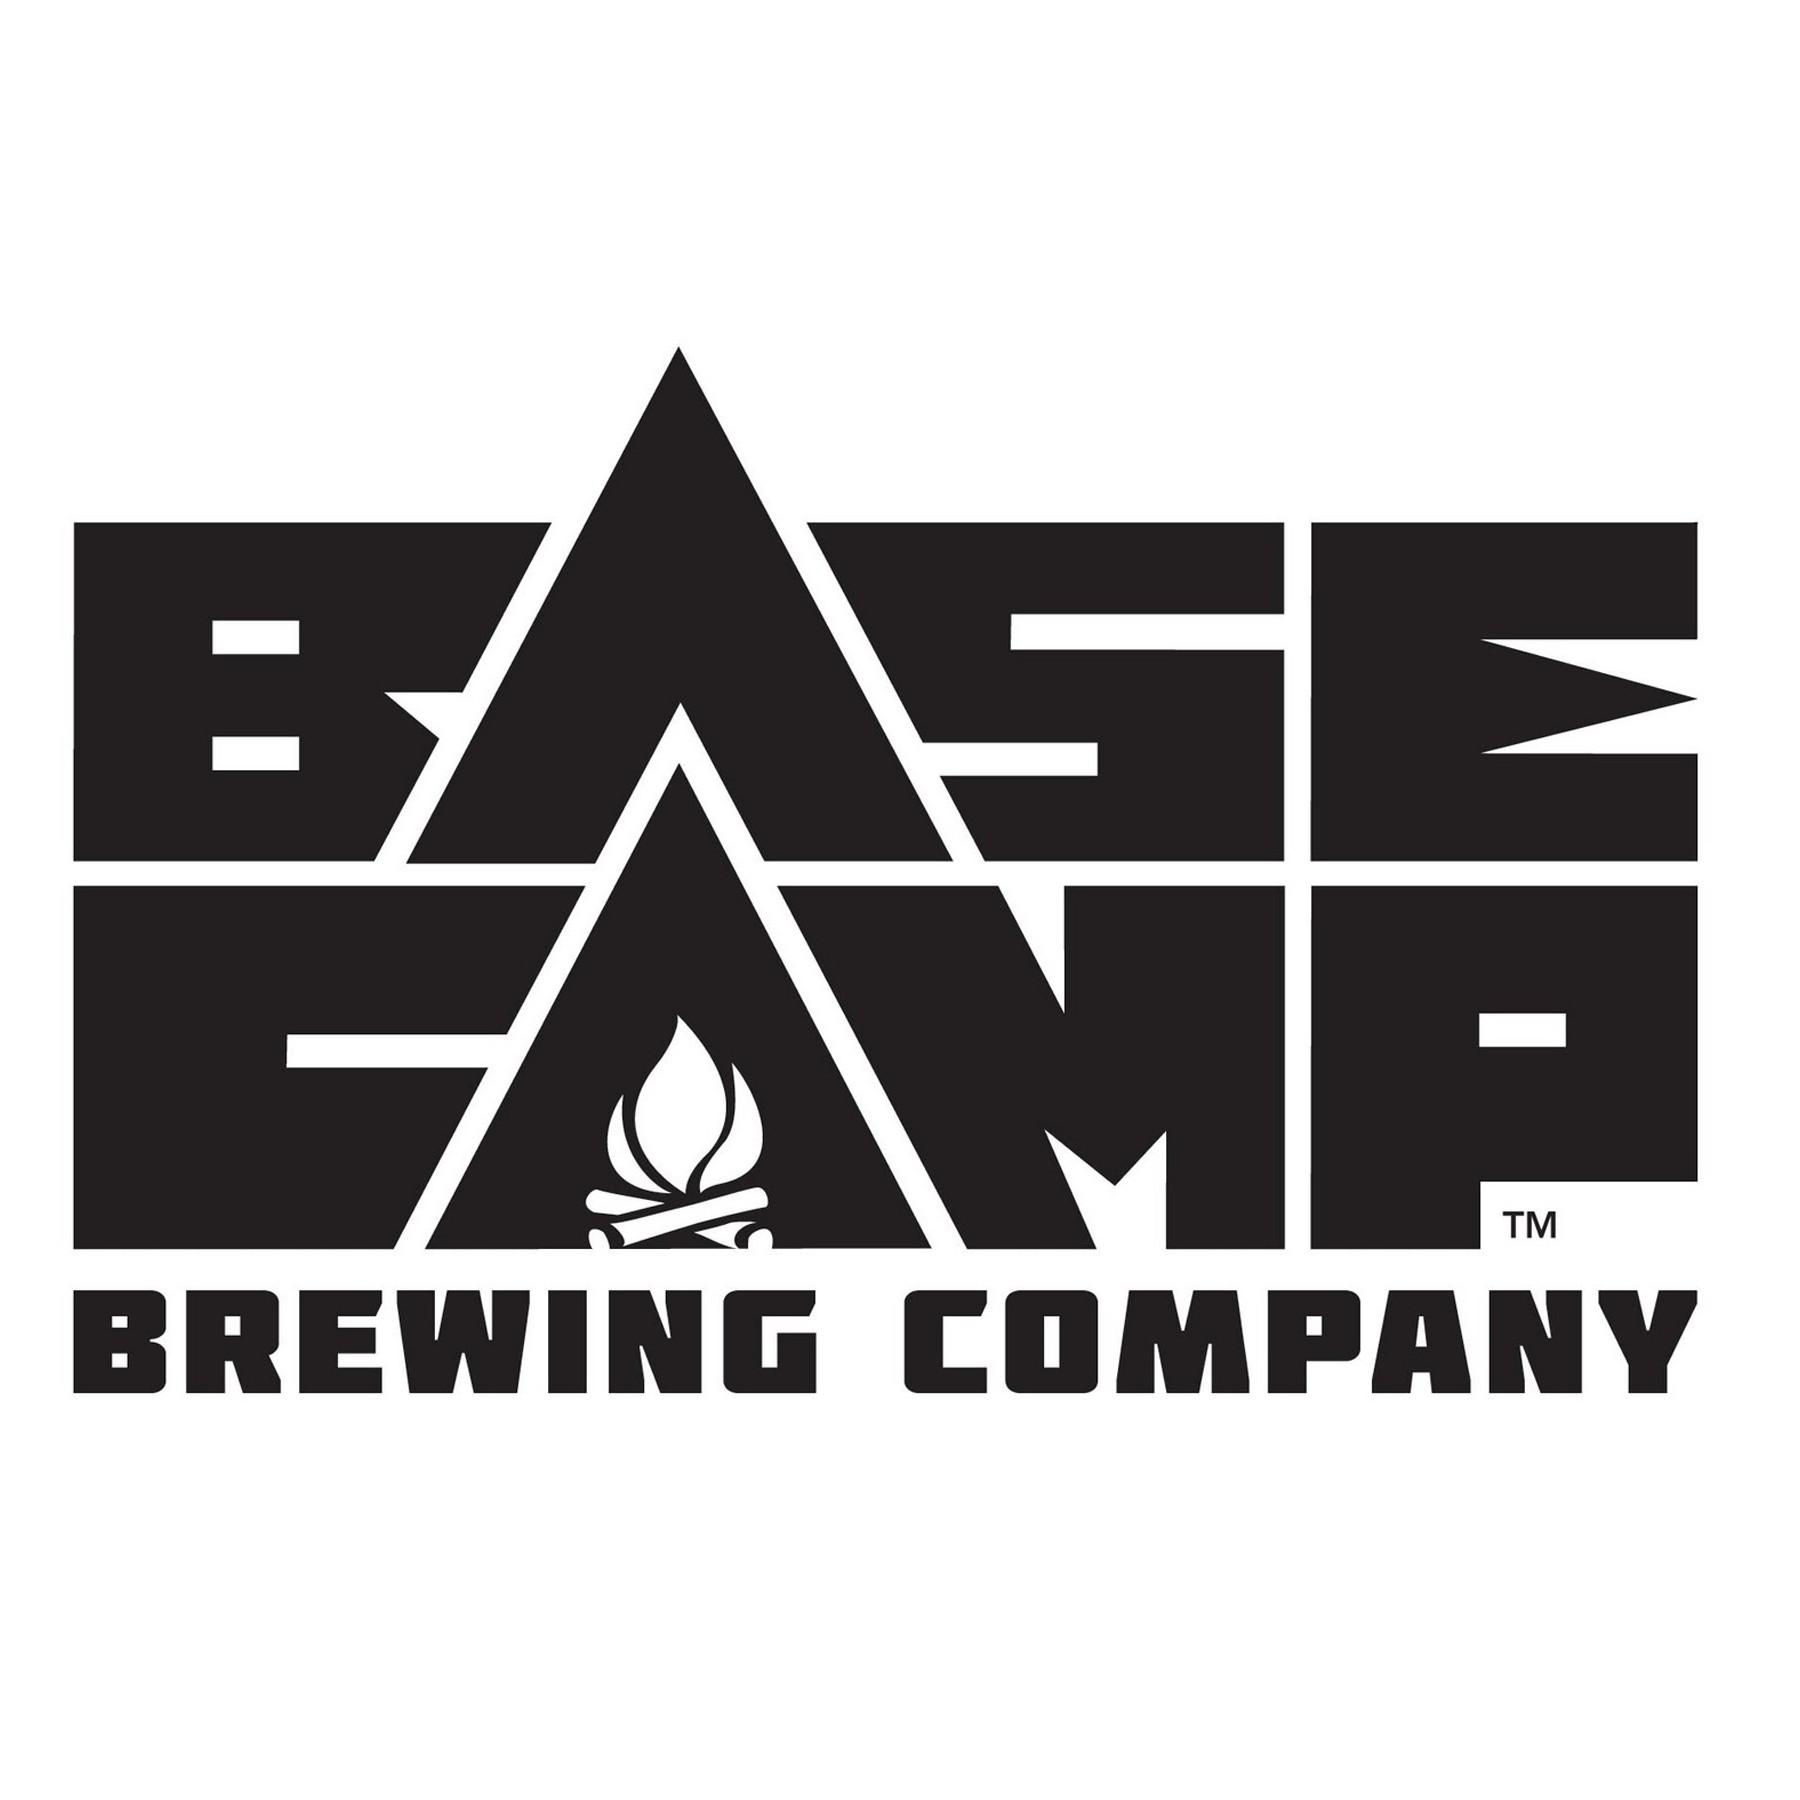 BASECAMP BREWING COMPANY